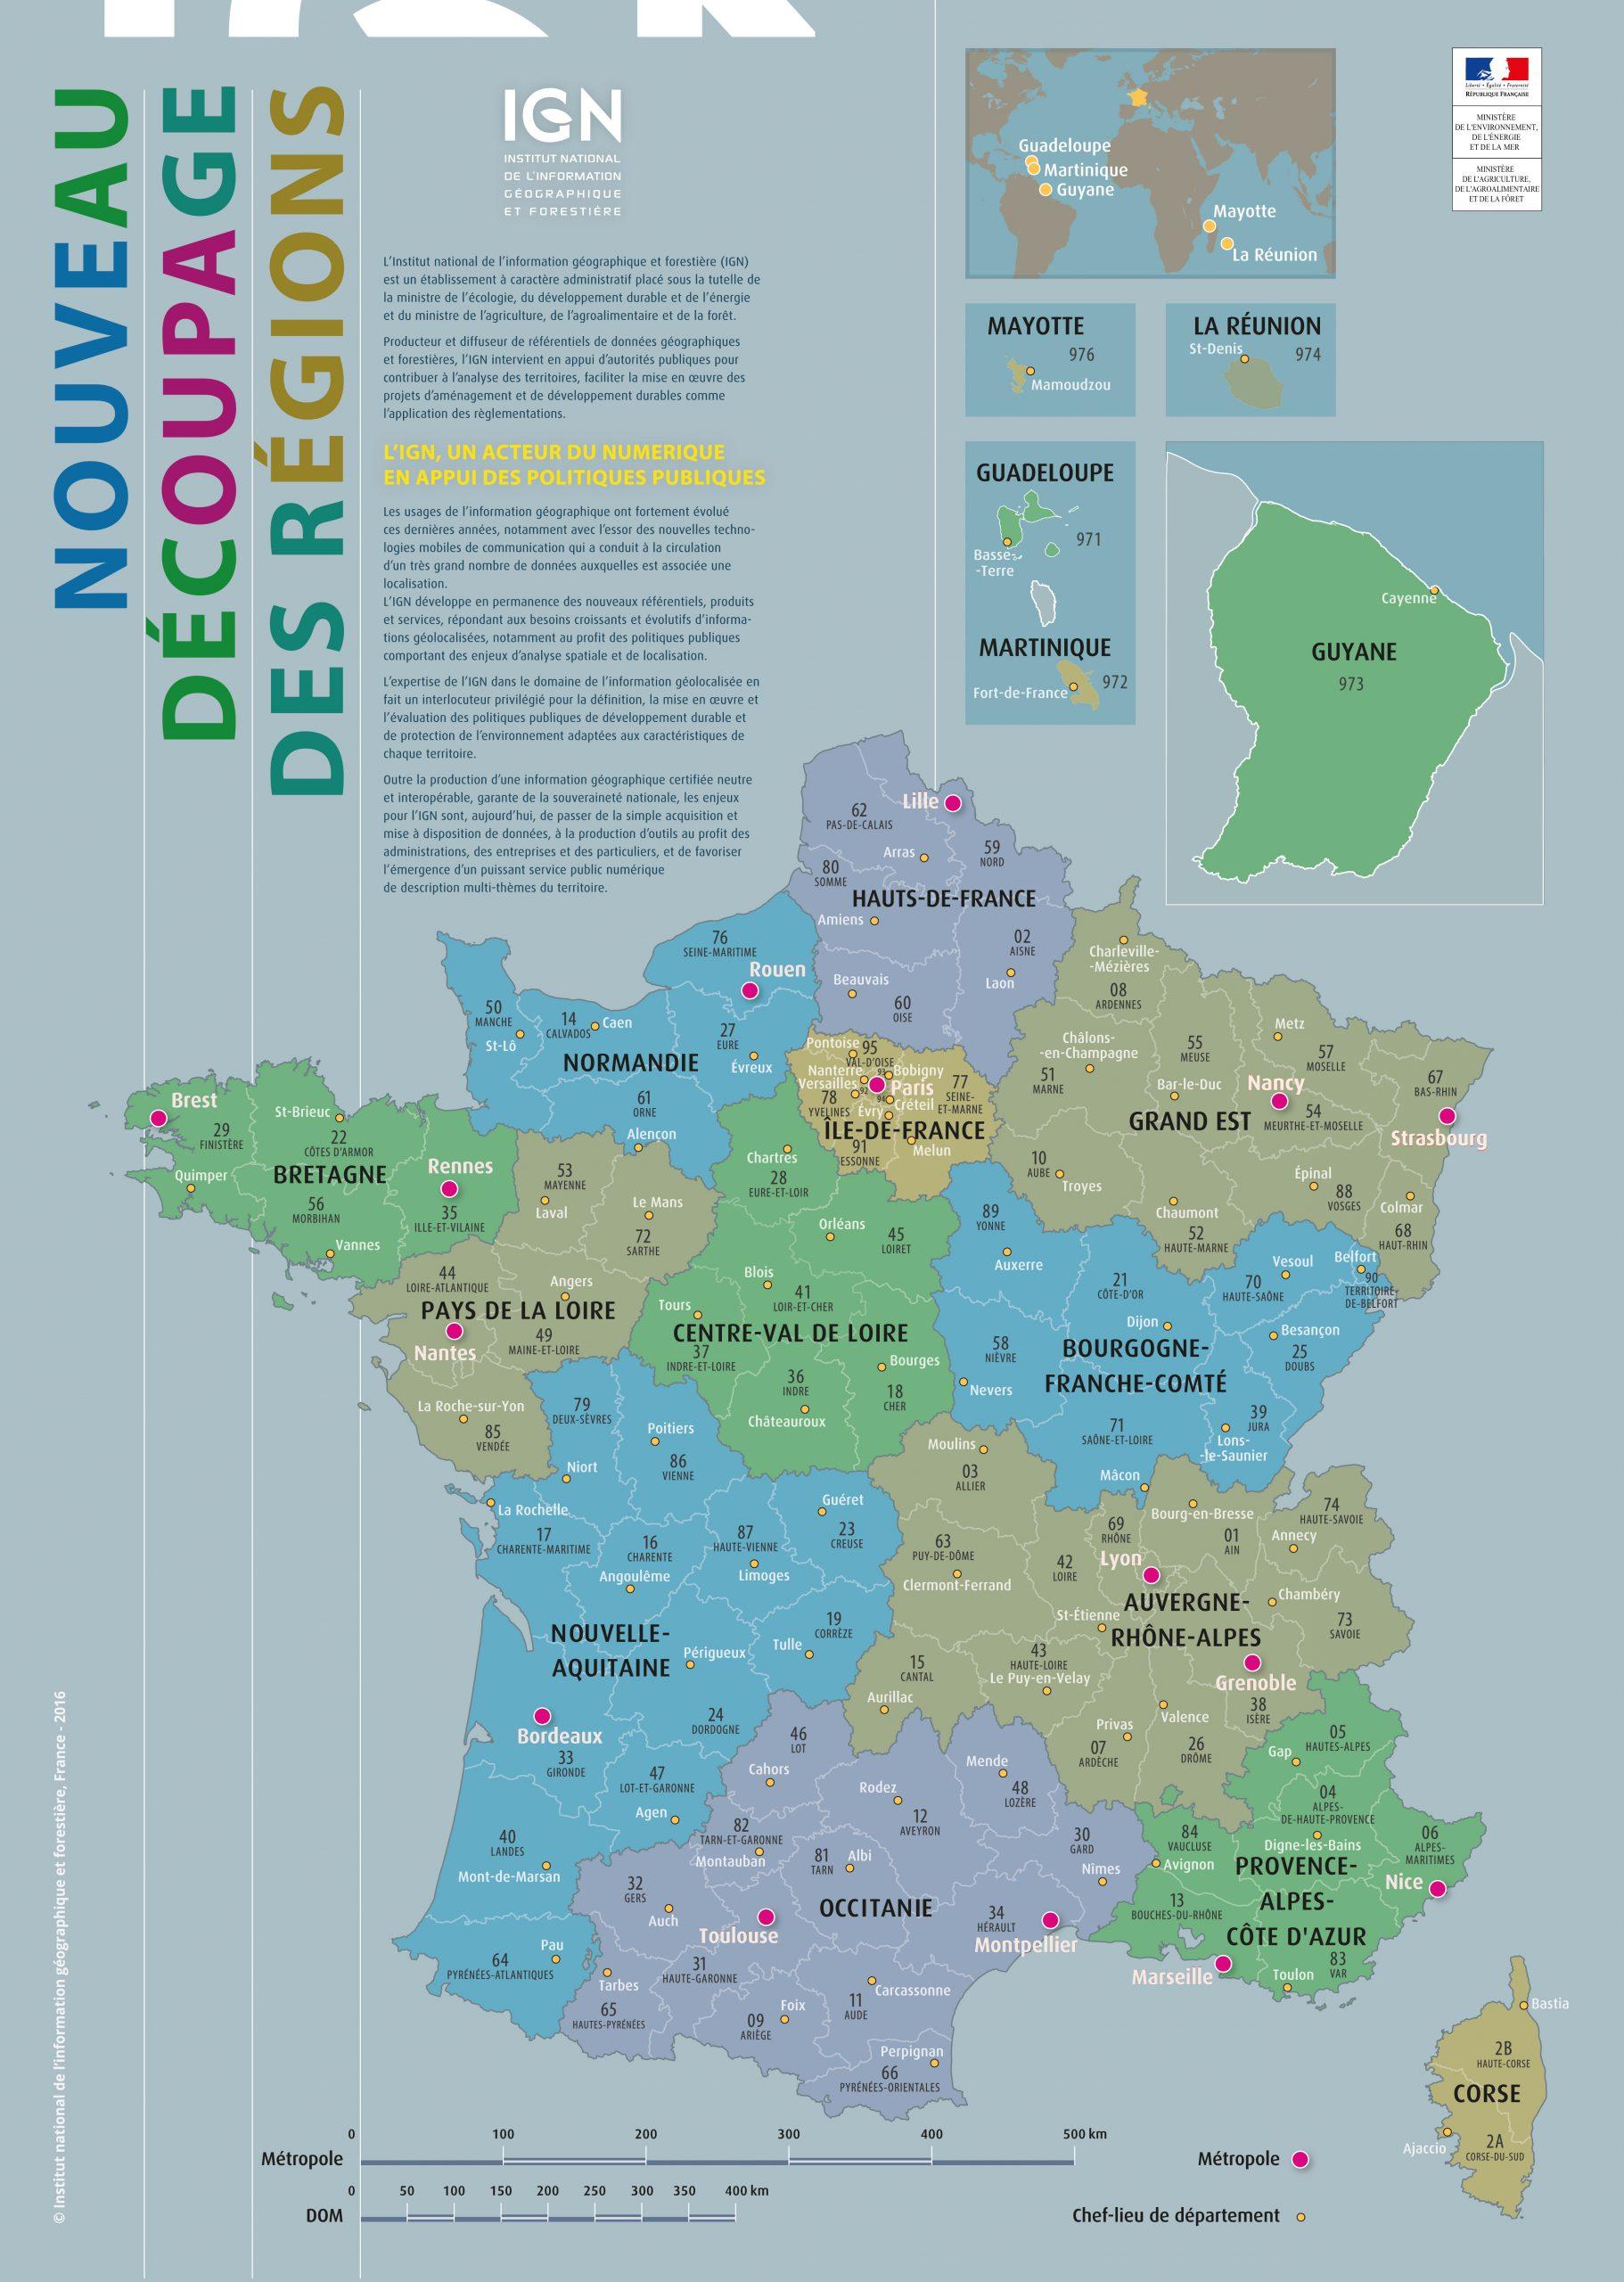 Fonds De Cartes | Éducation concernant Grande Carte De France À Imprimer